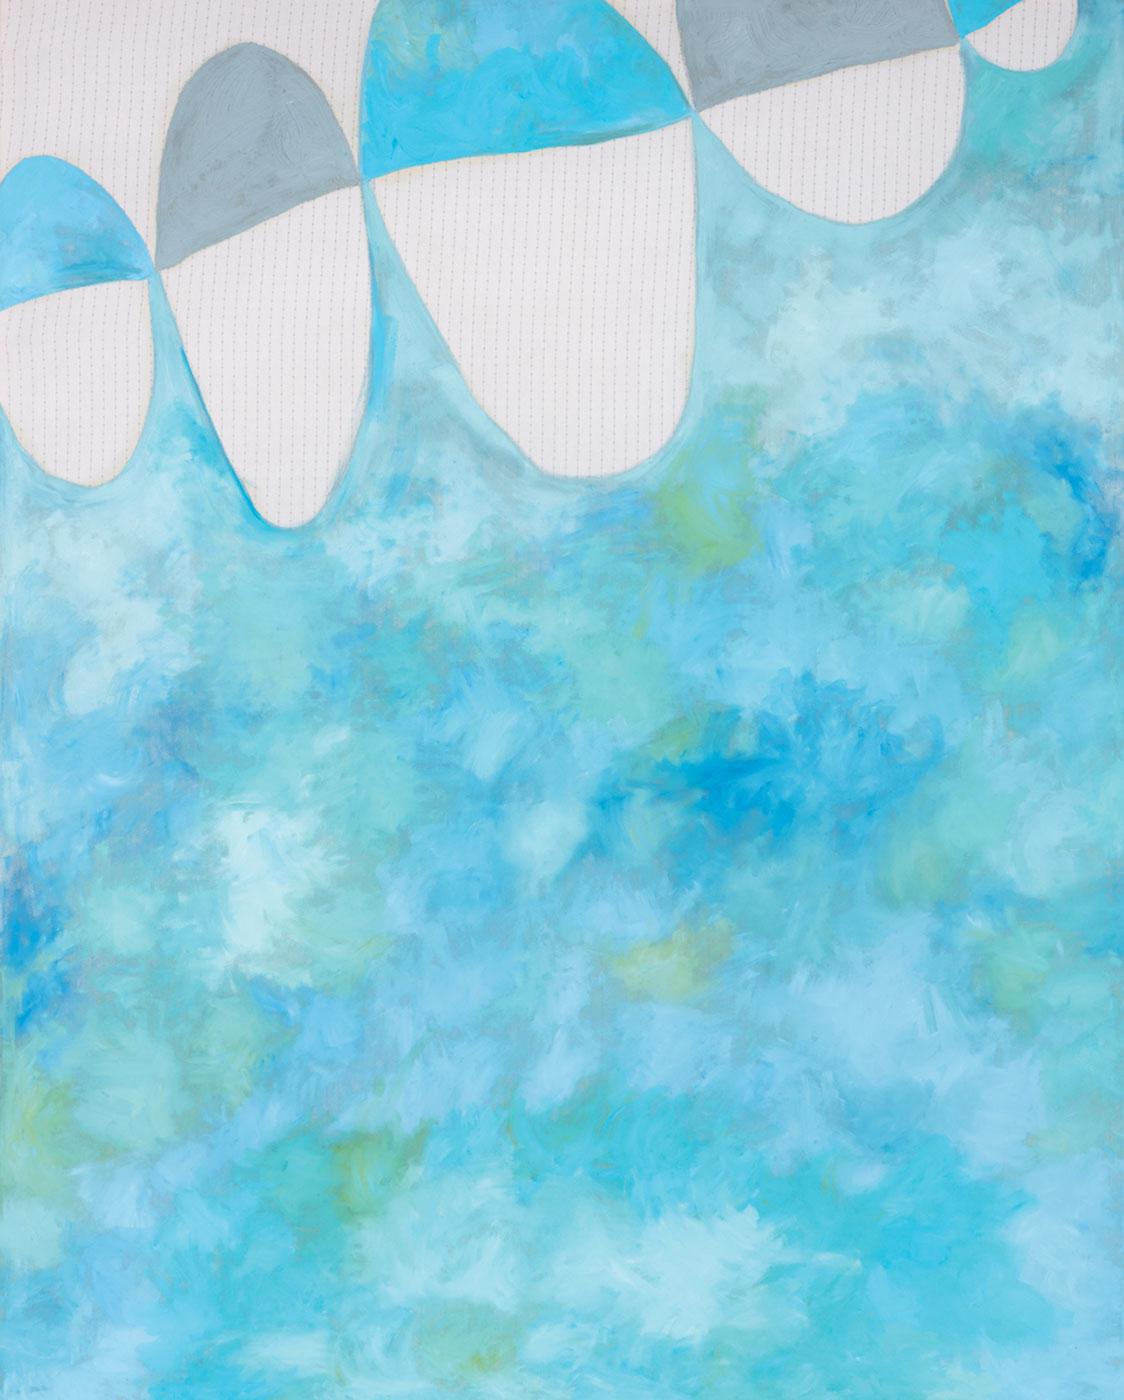 Ellen E. Smith - RHYTHM AND BLUES (SHEETS)